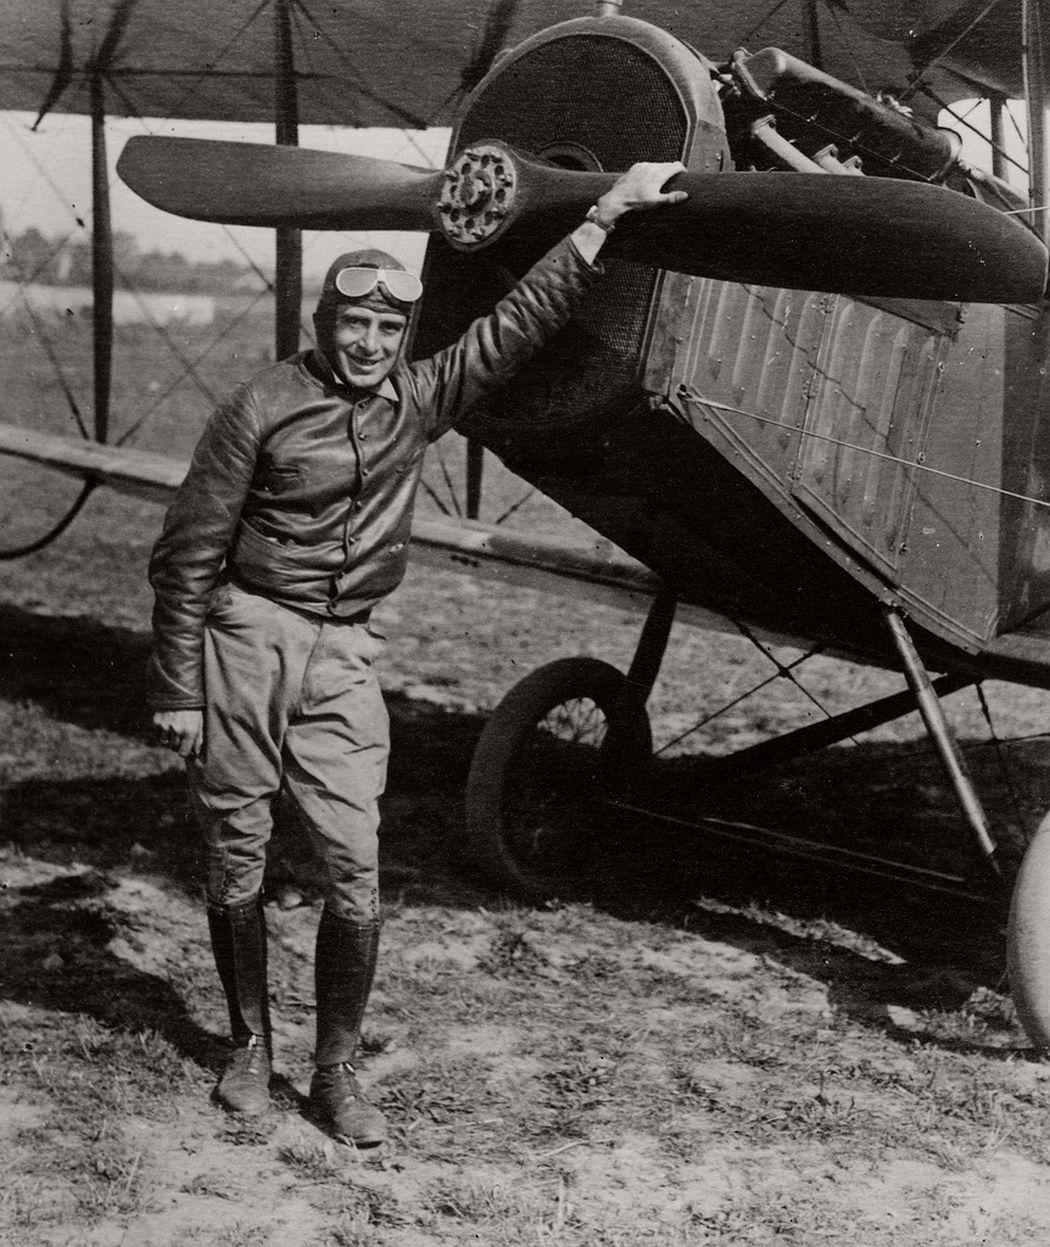 Air Mail pilot Eddie Gardner in 1918.